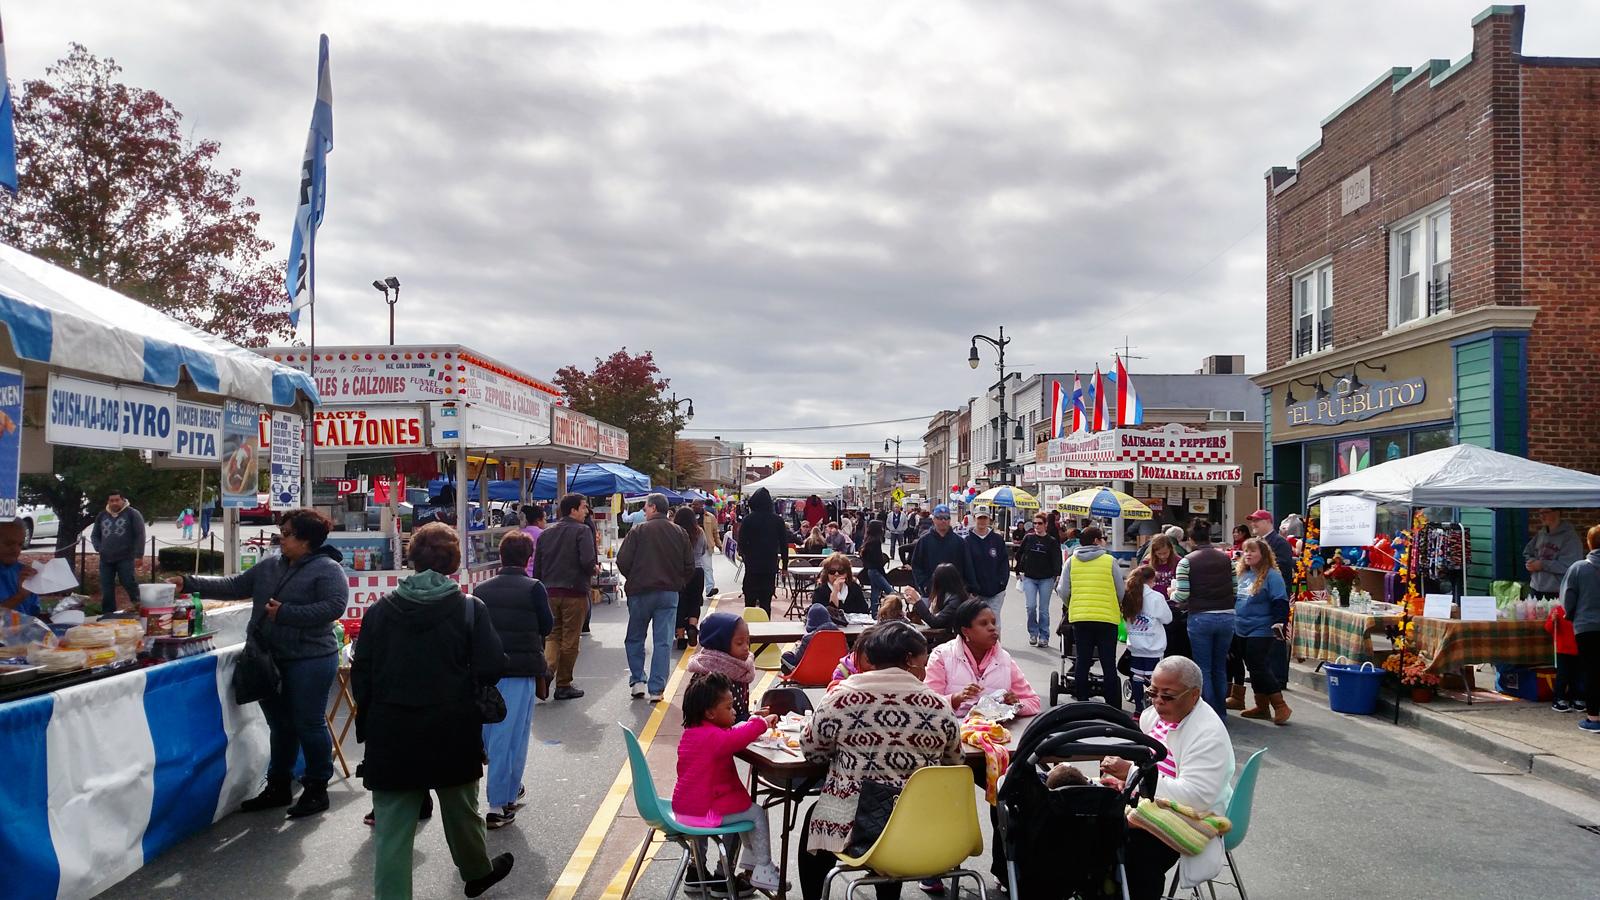 Street fair to showcase Westbury merchants